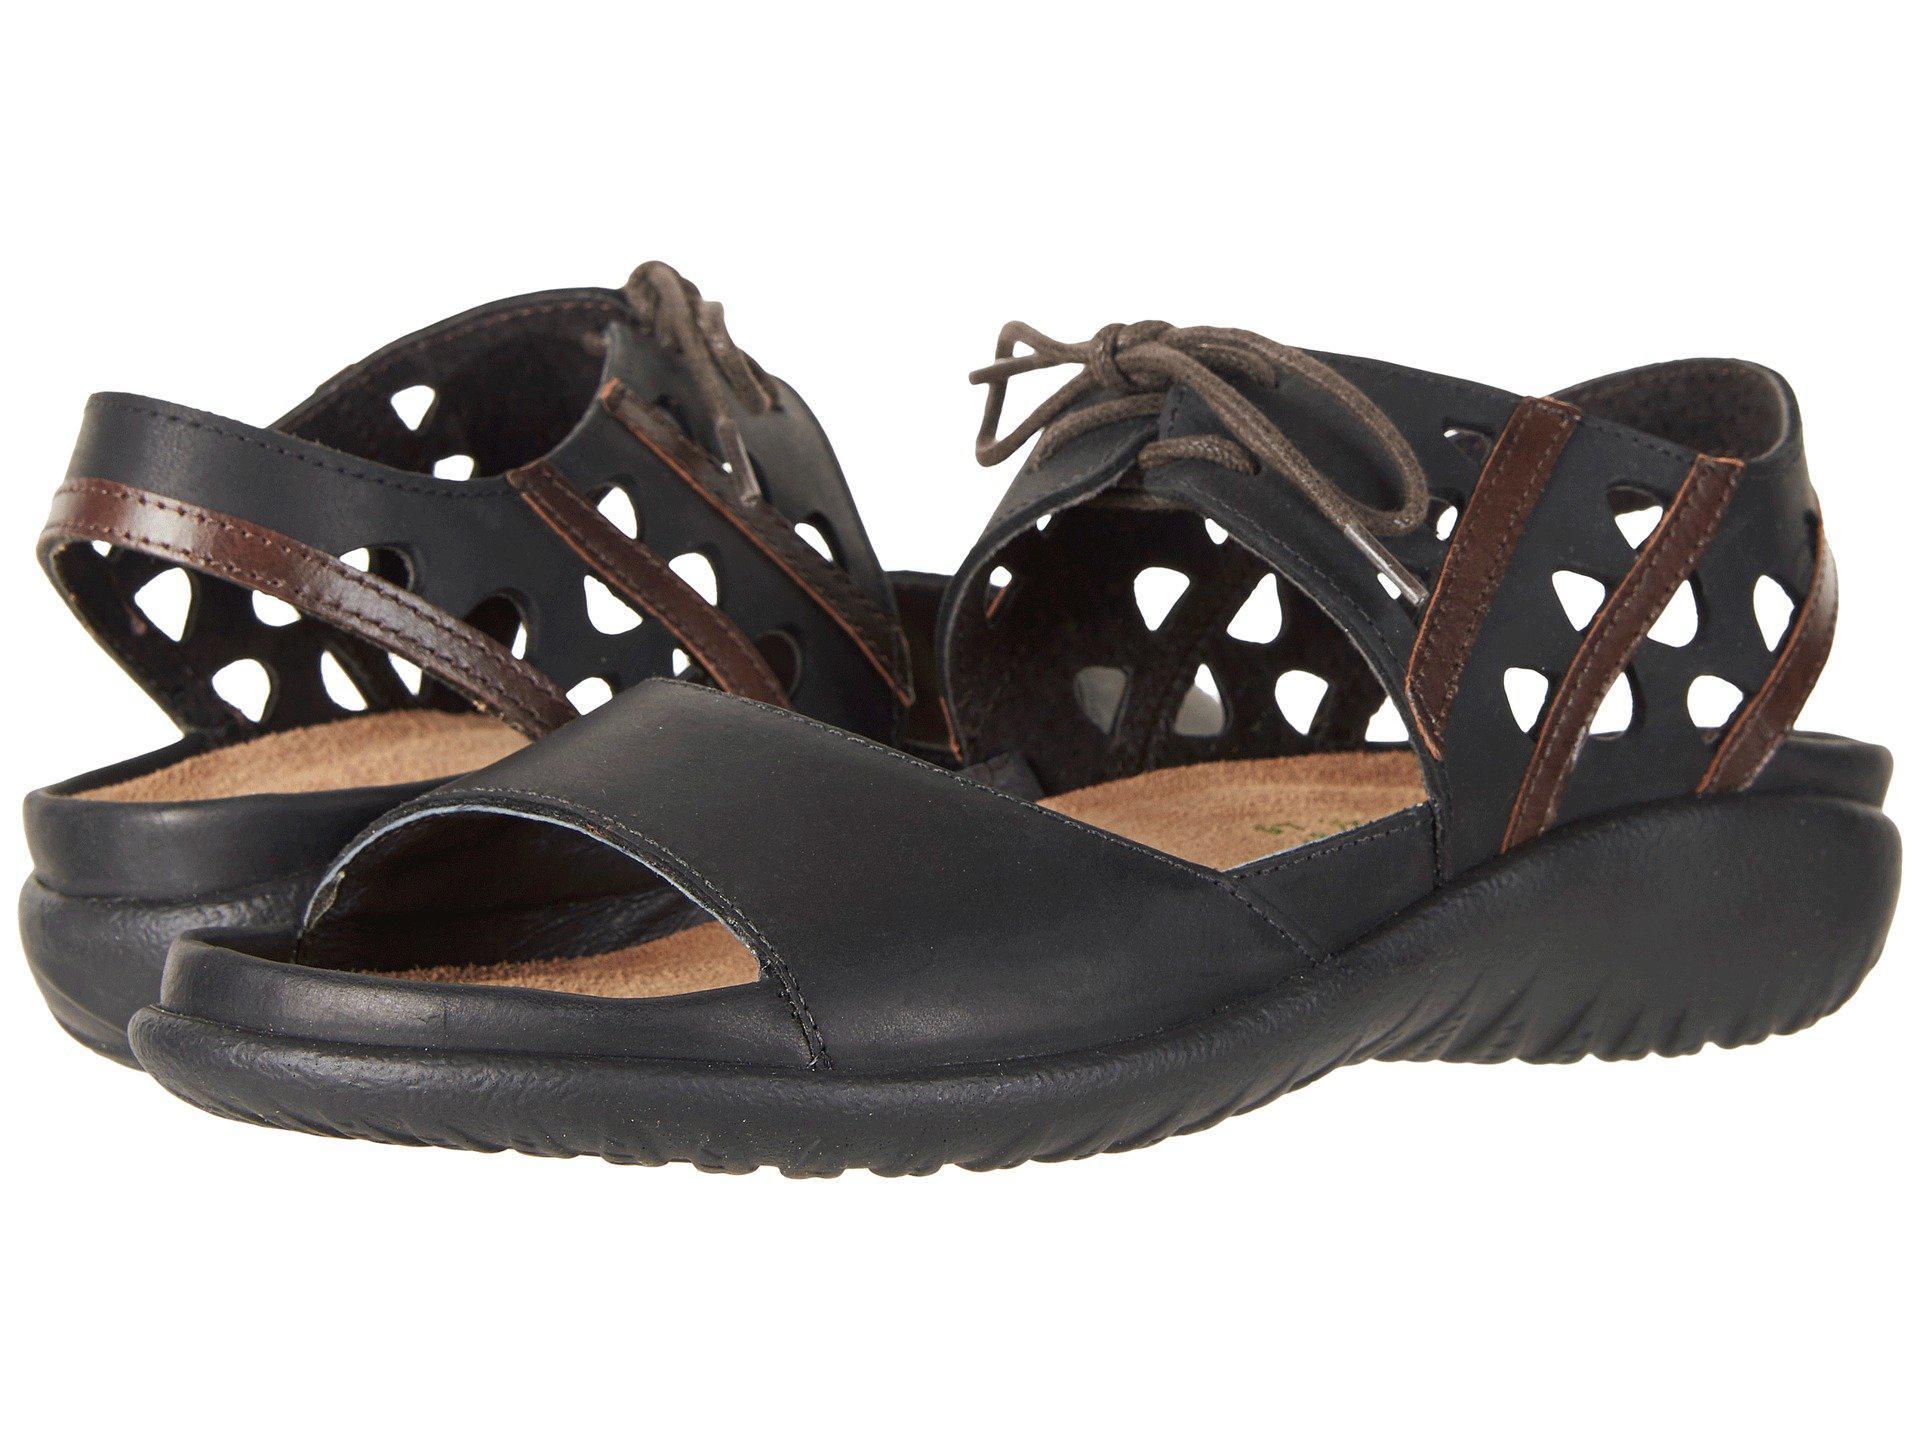 322b7708ad67 Lyst - Naot Mangere (stone Nubuck khaki Beige Leather) Women s Shoes